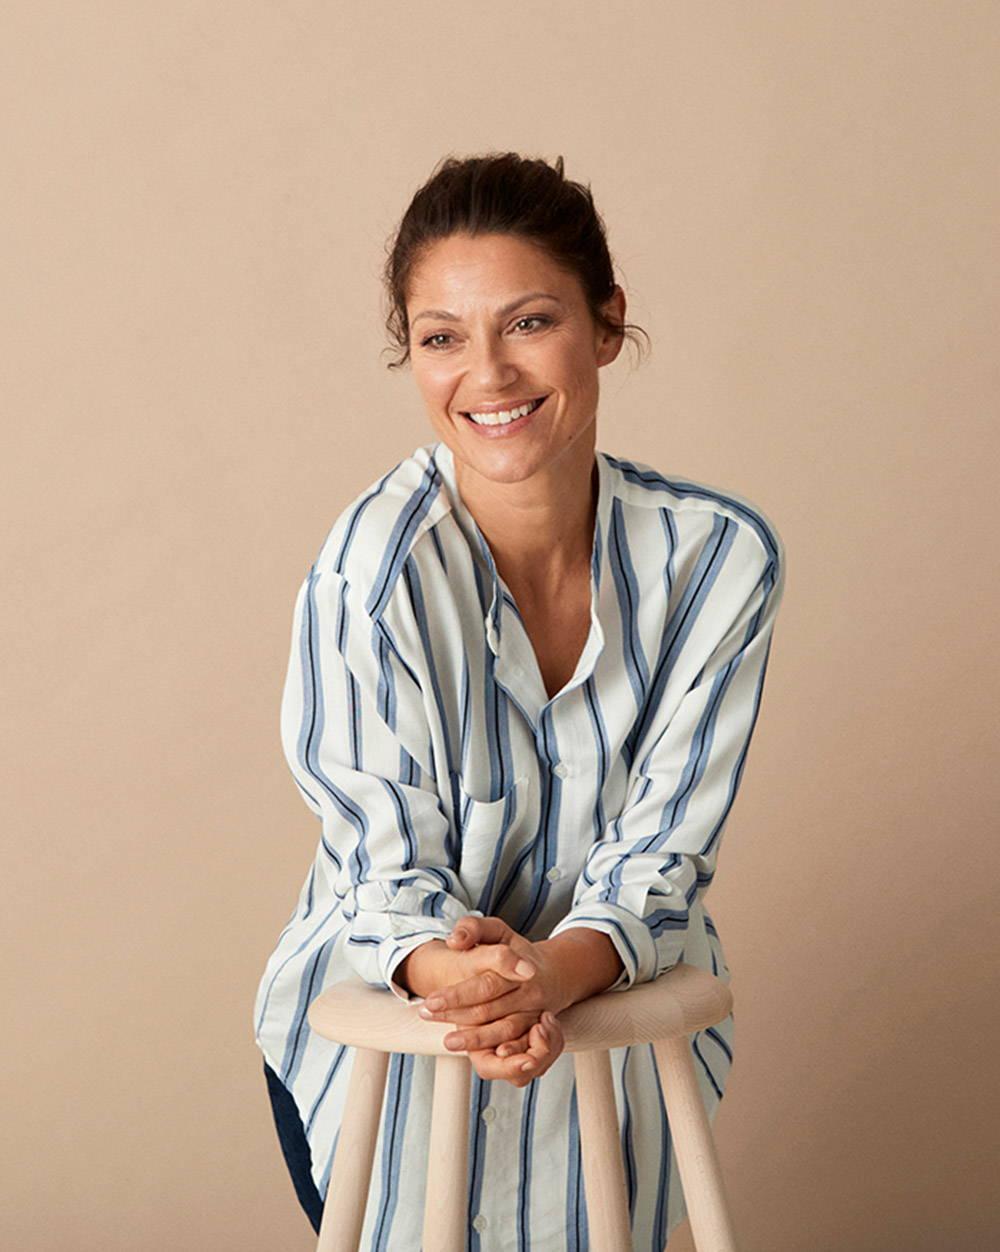 Ivana Shirt - Editorial Image